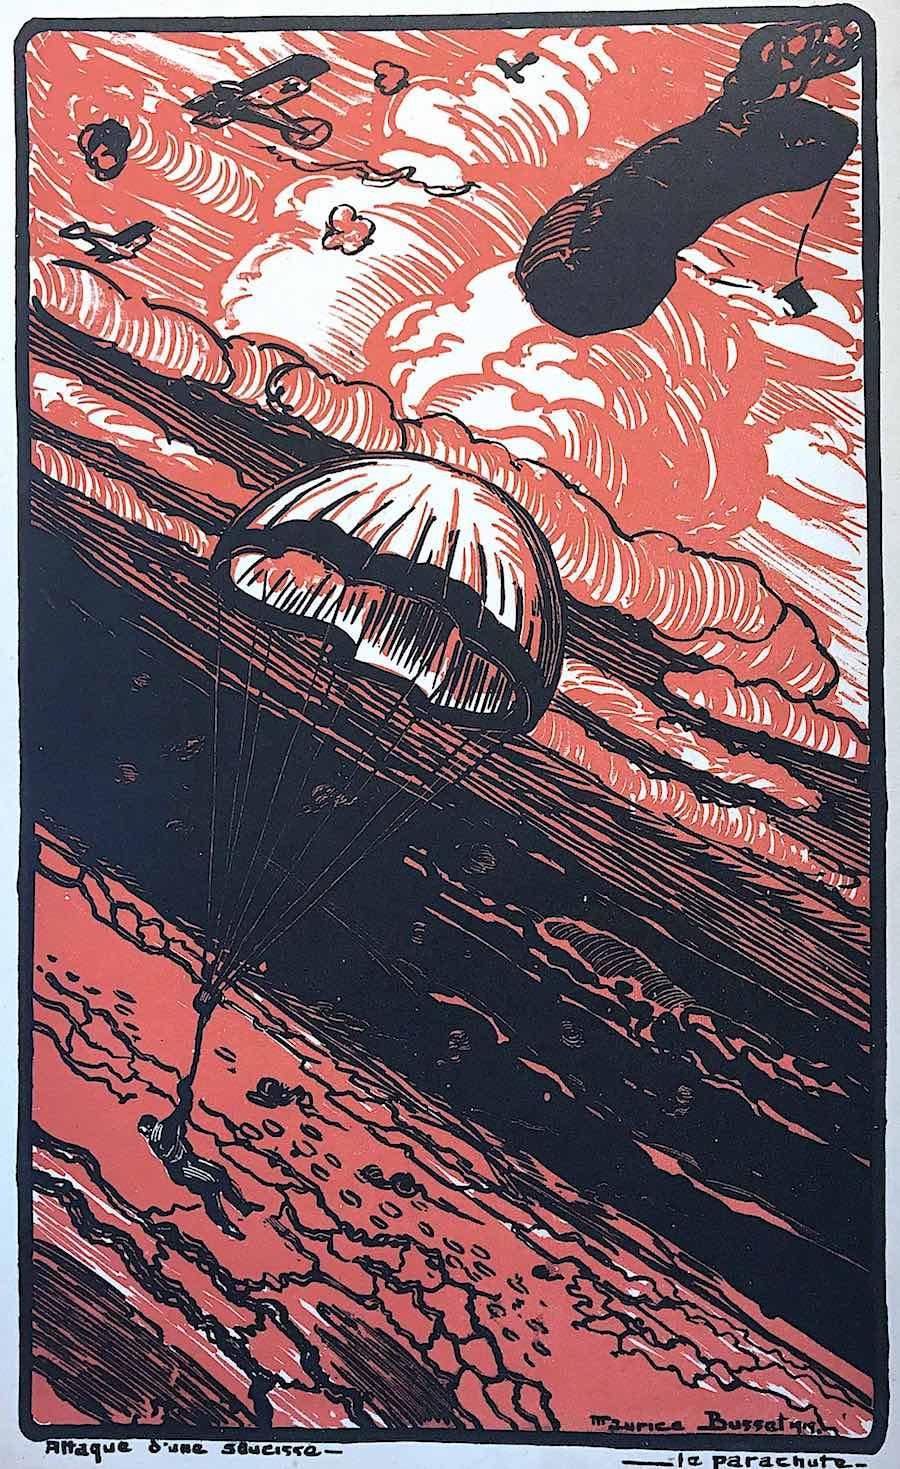 a Maurice Busset color illustration of parachutists